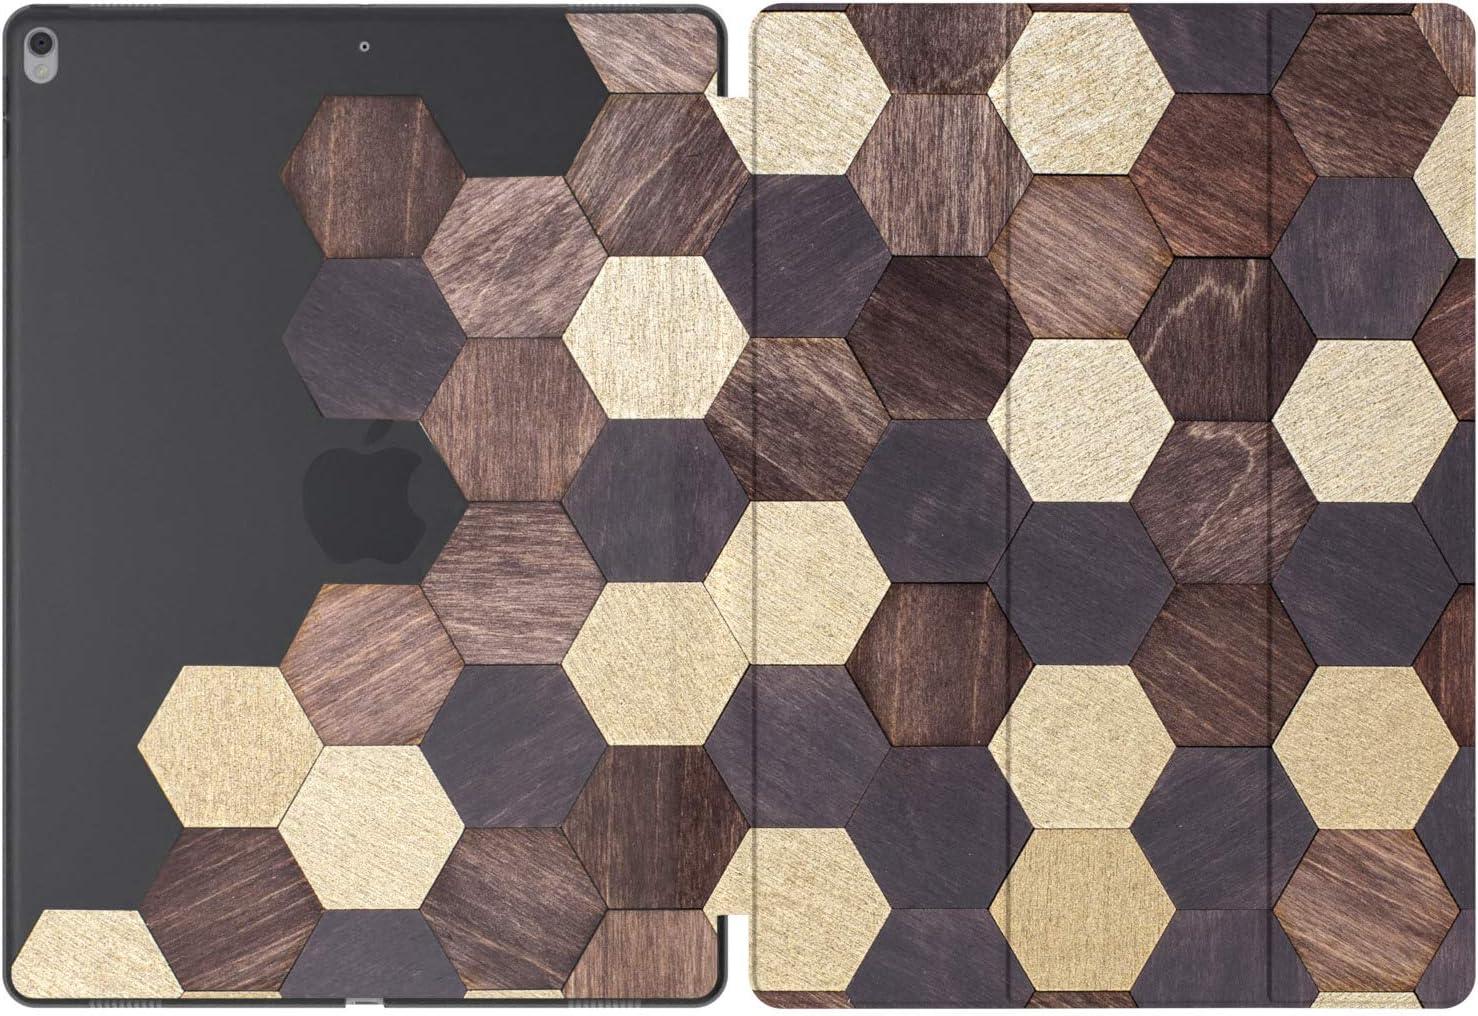 Mertak Case Compatible with iPad Pro 11 2020 12.9 inch Air 3 2 10.2 8th 7th 2018 10.5 9.7 Mini 5 4 Hexagon Mosaic Design Honeycomb Abstract Auto Wake Sleep Brown Print Clear Slim Tiles Wood